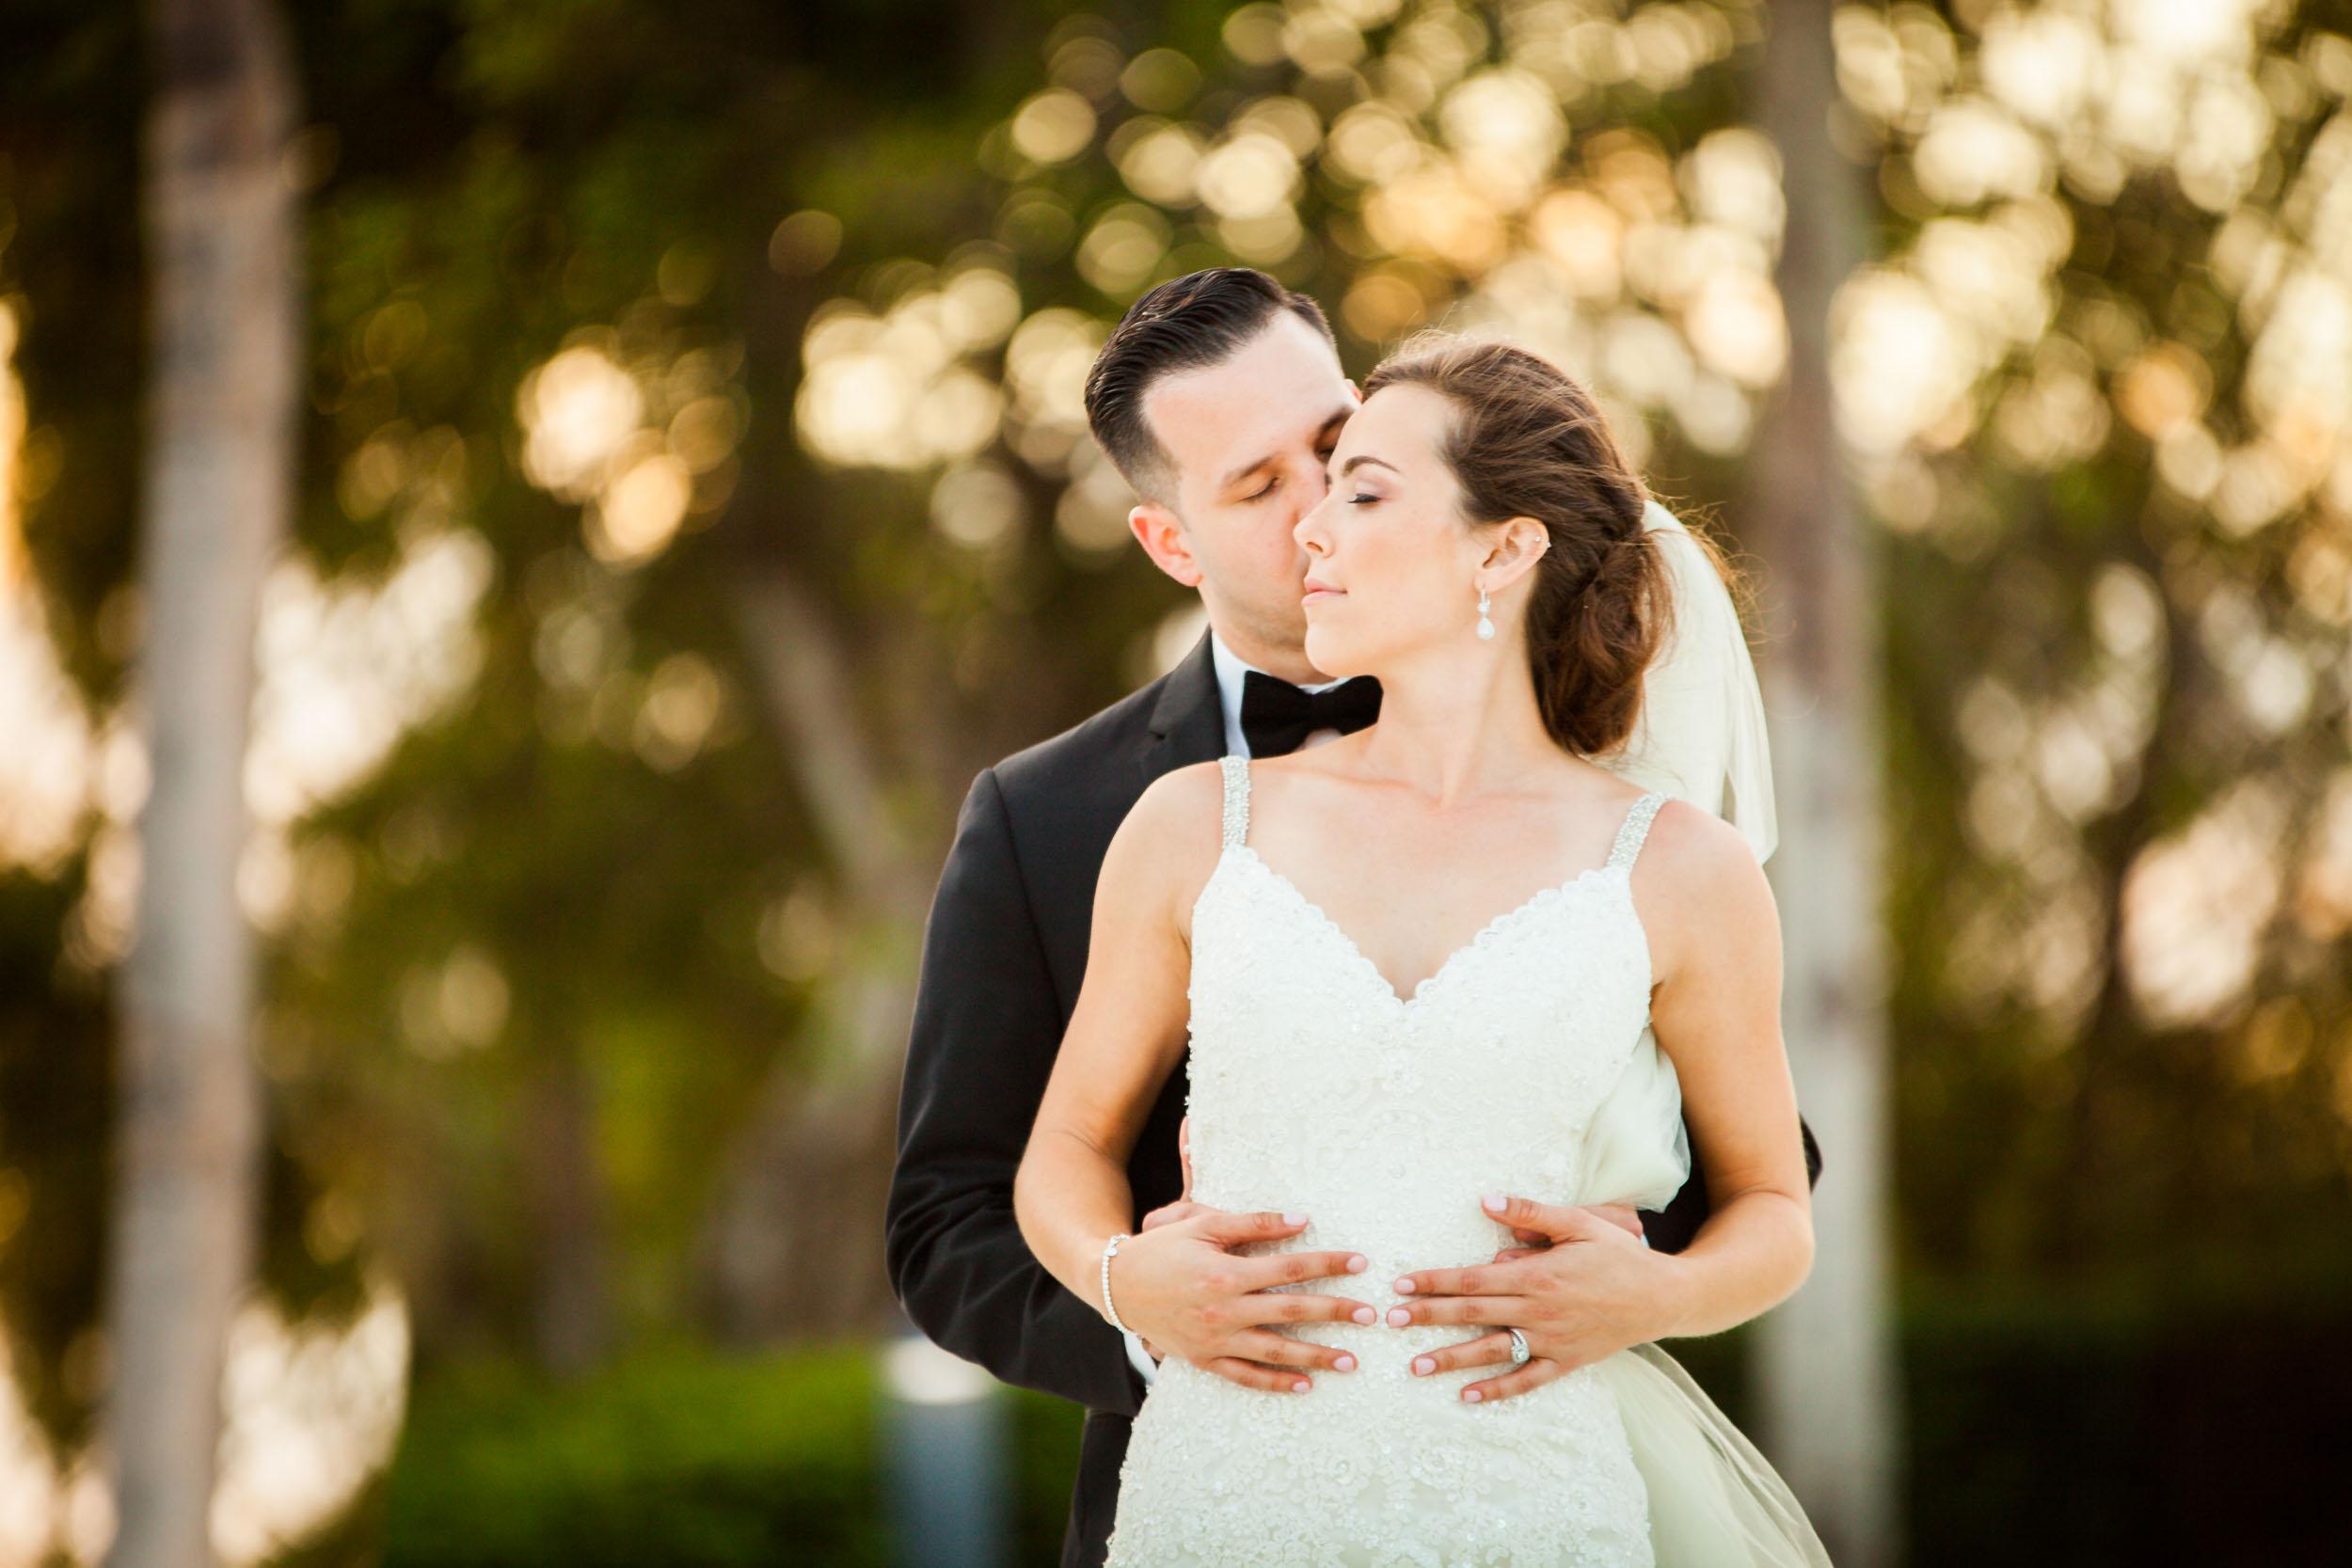 Flordia-Wedding-Photography-47.jpg